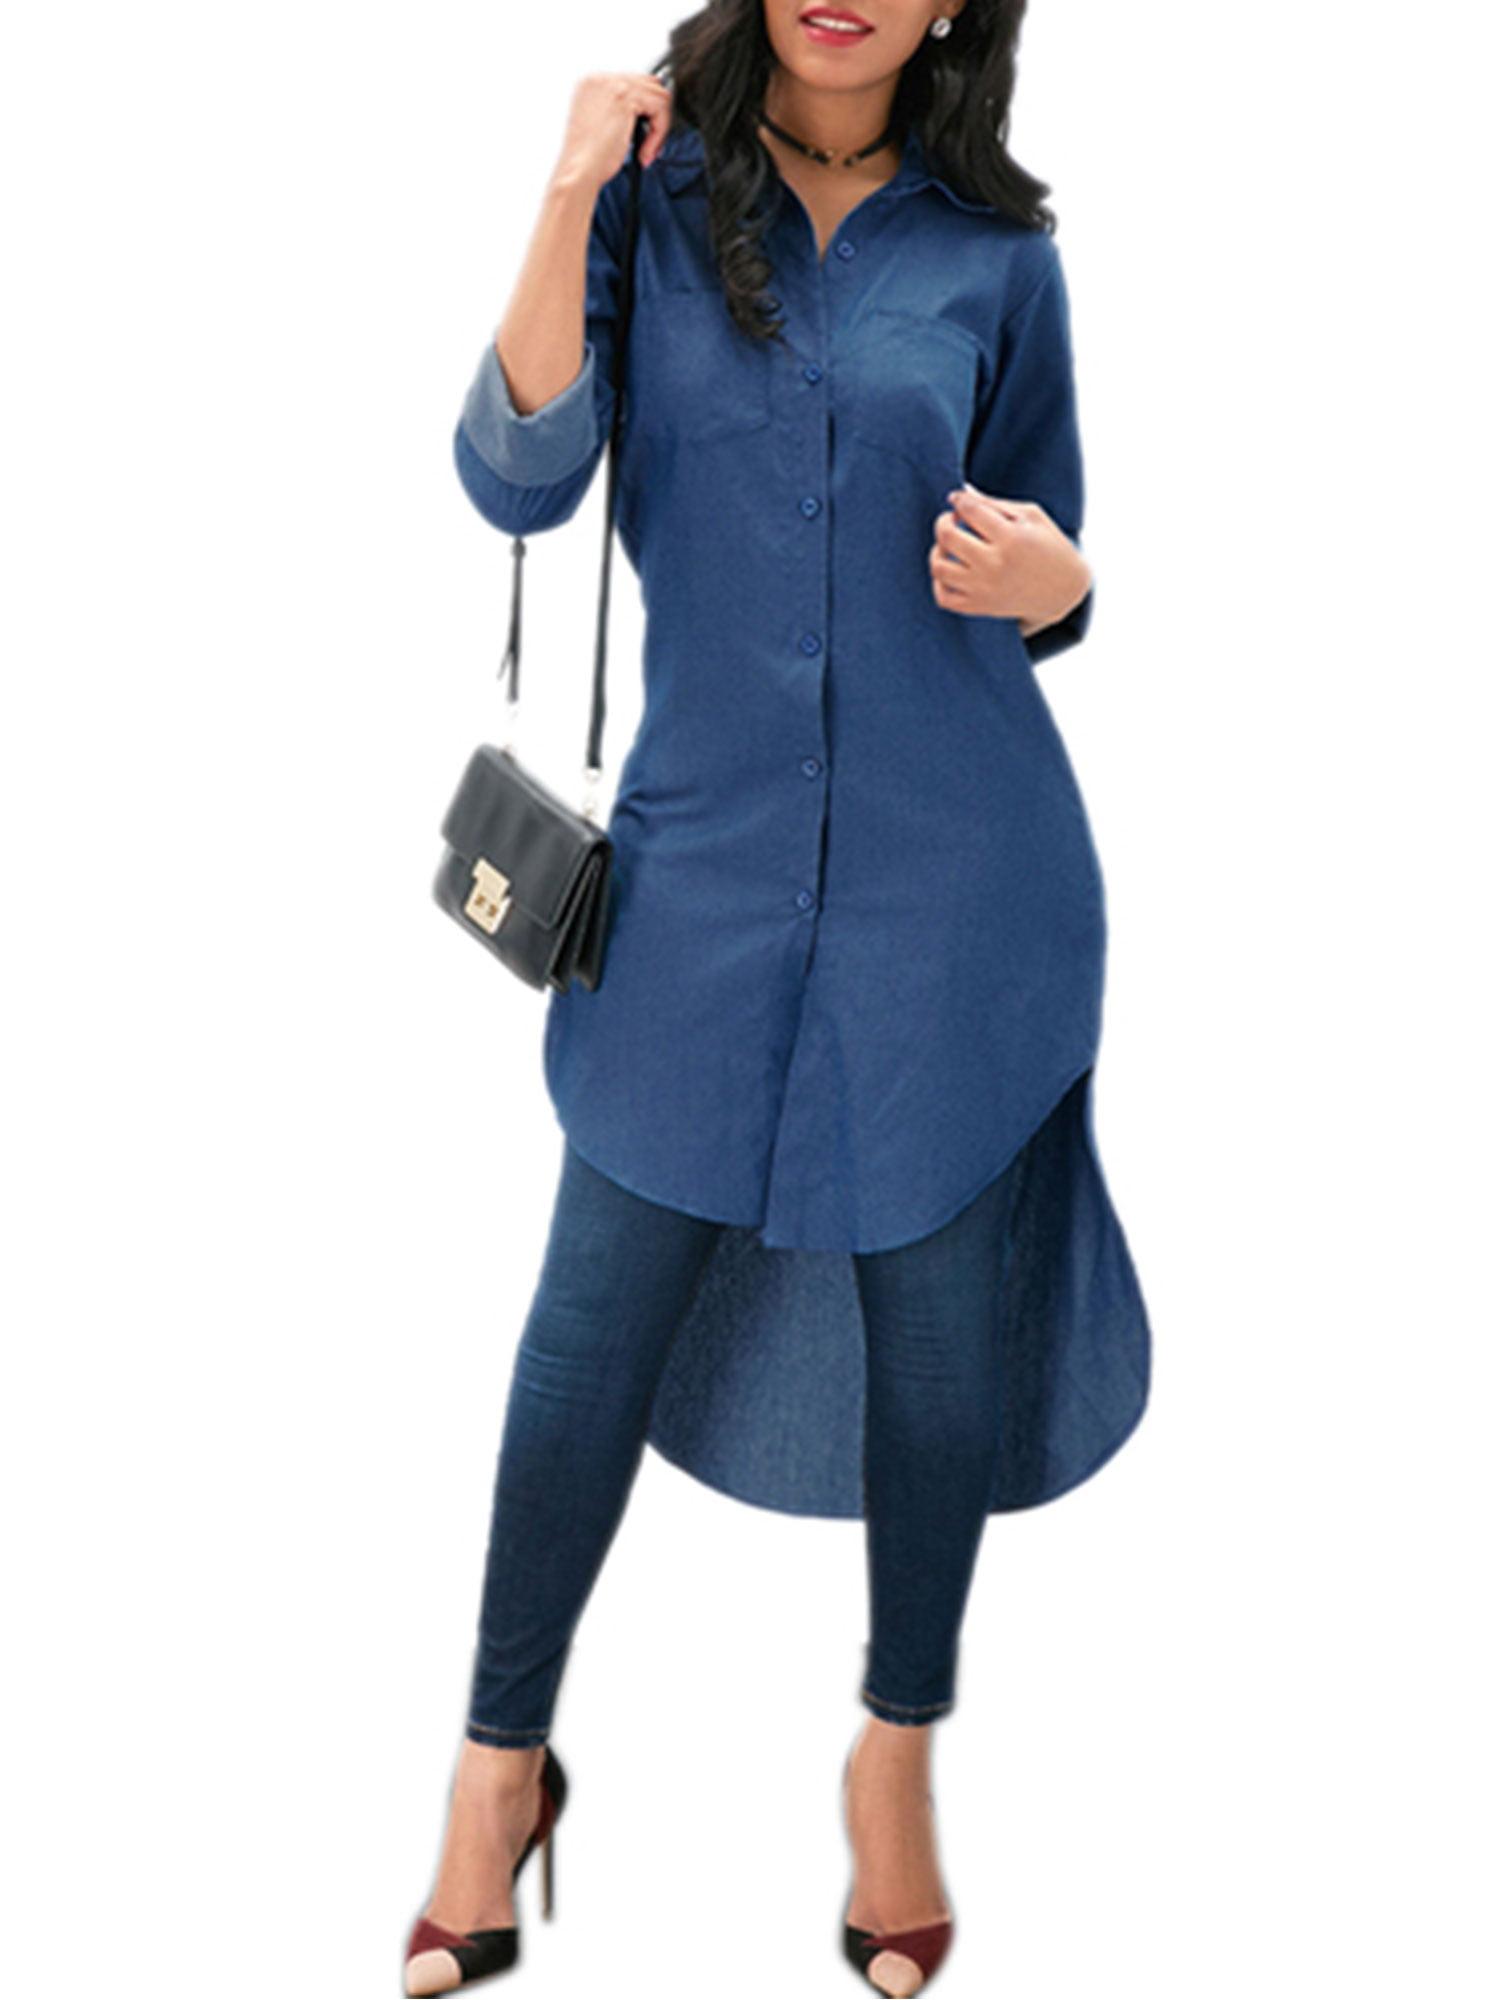 cfc427ba7d9 Sexy Dance - Denim Shirt Women Blue Jeans T-Shirt Long Sleeve Casual Loose  Tunic Dress Ladies Autumn Button Lapel V Neck High Low Top - Walmart.com